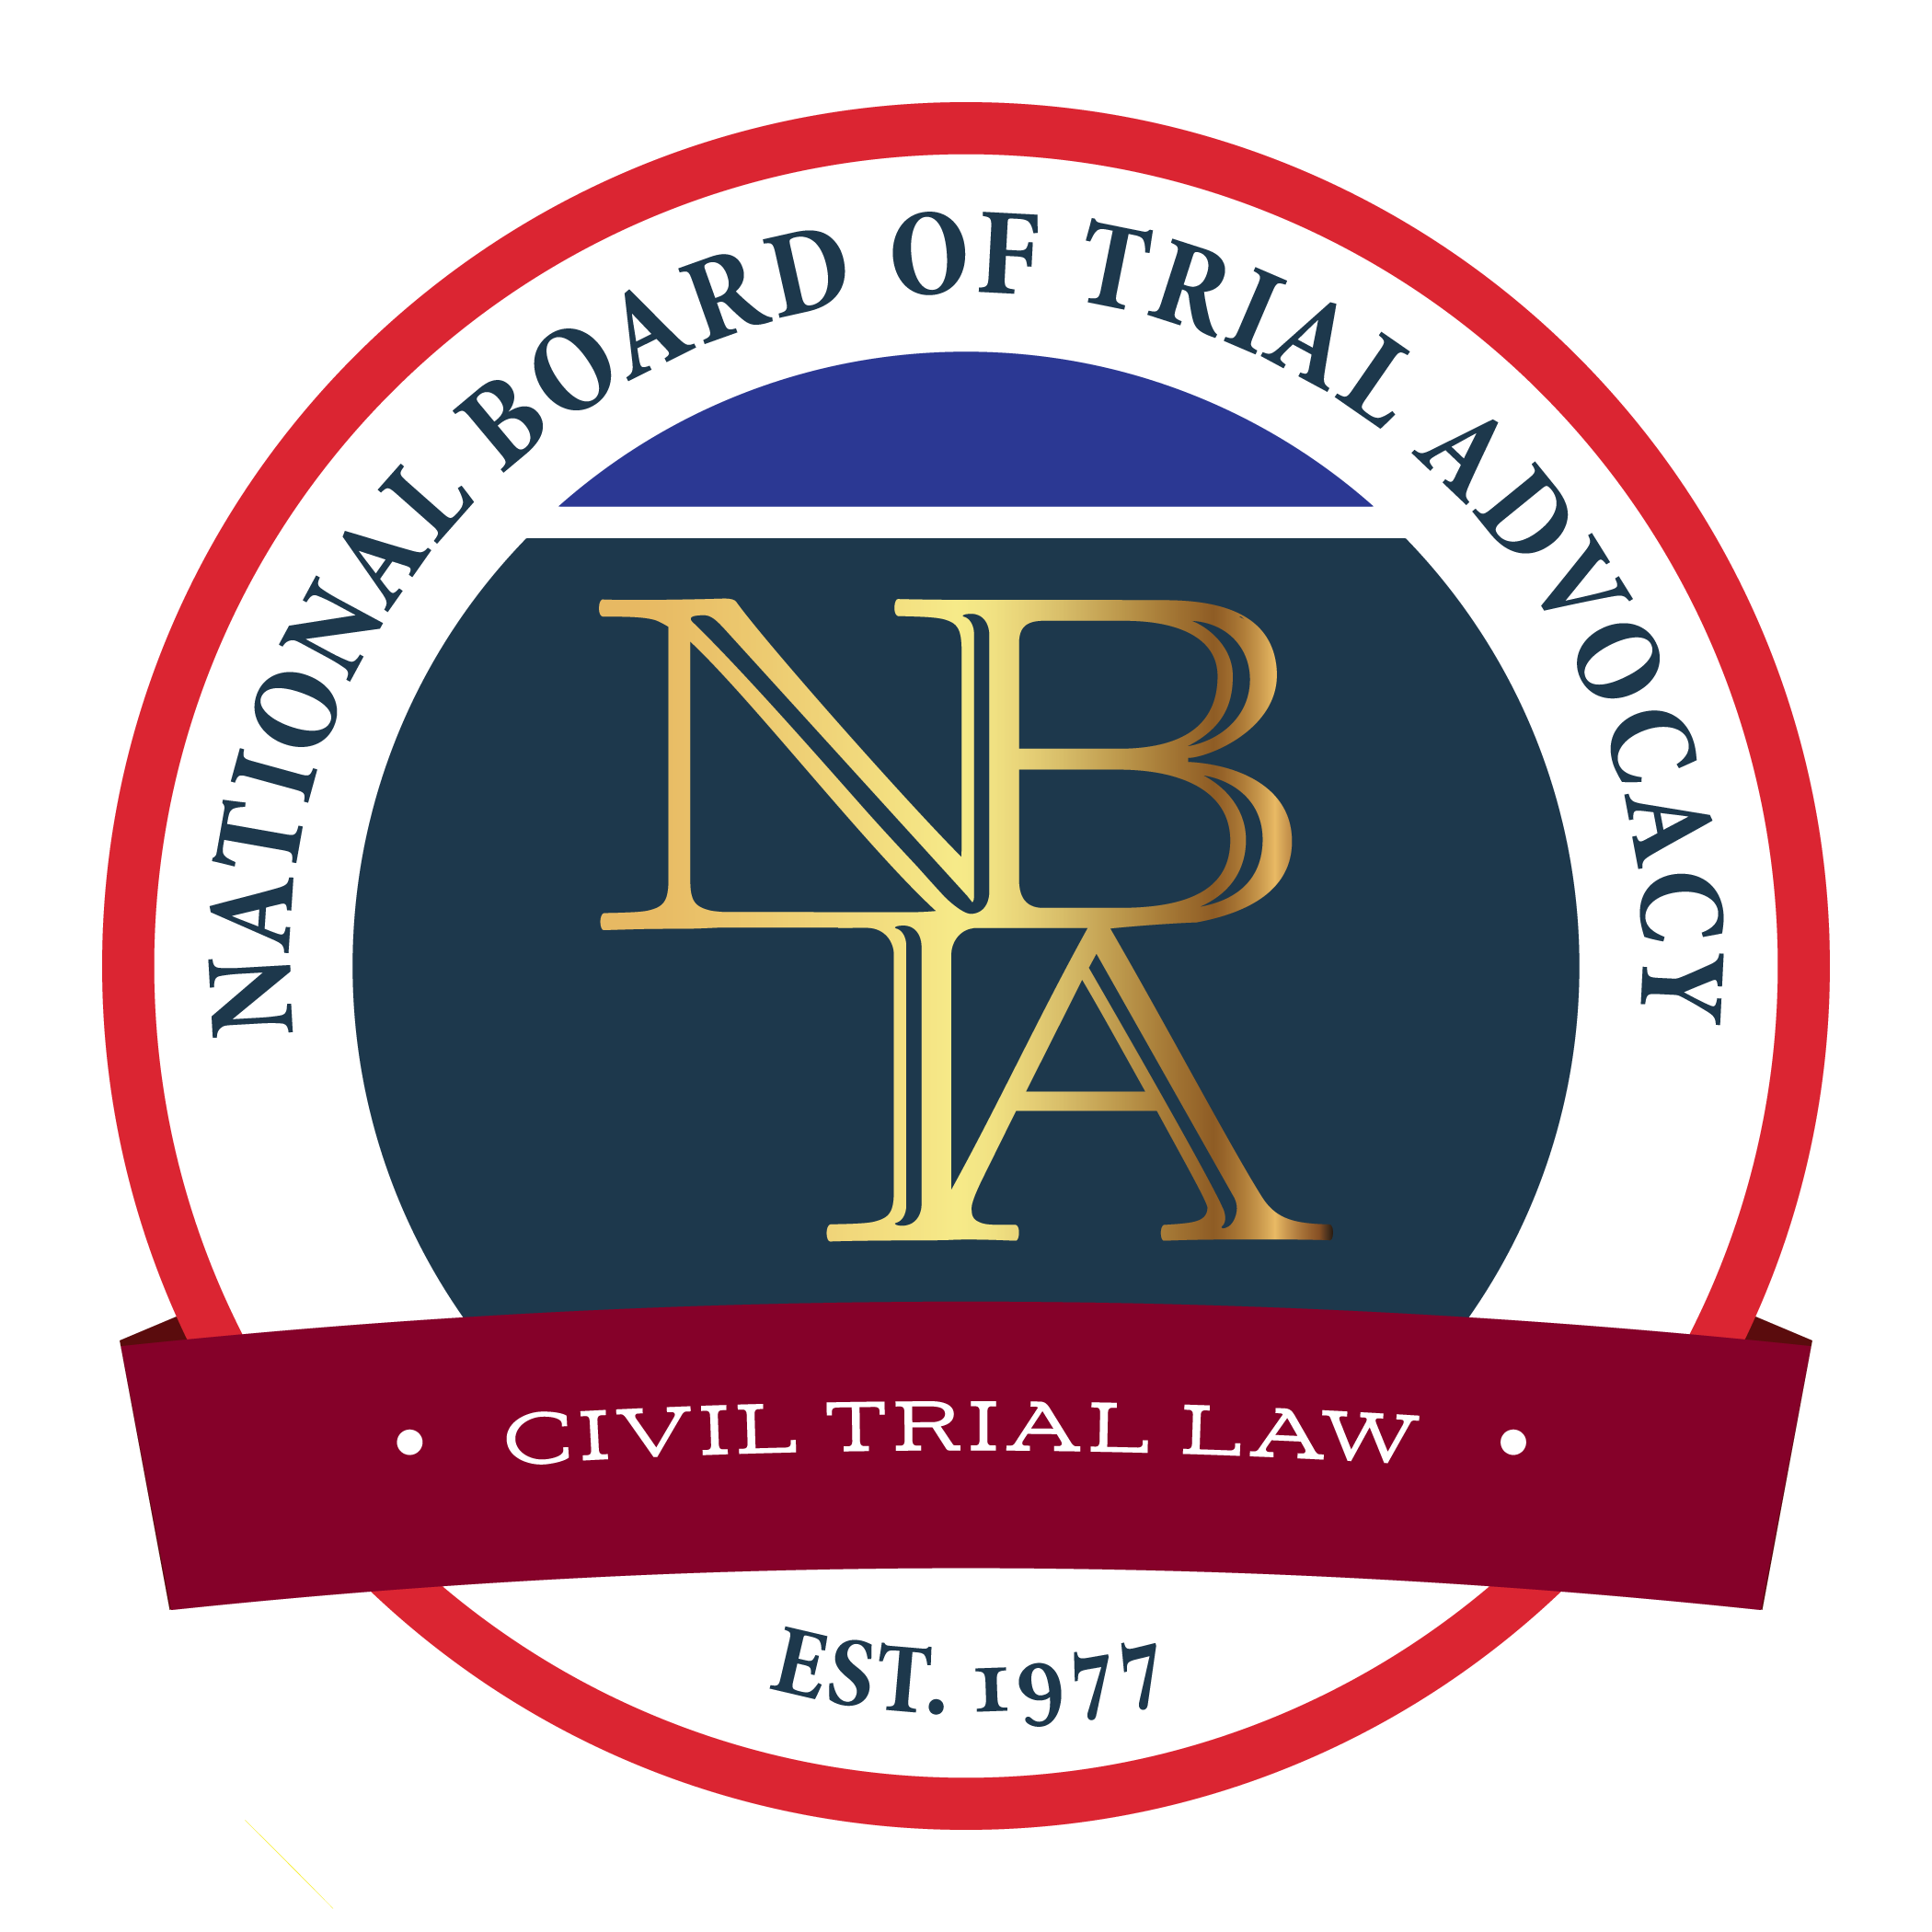 NBTA civiltriallaw